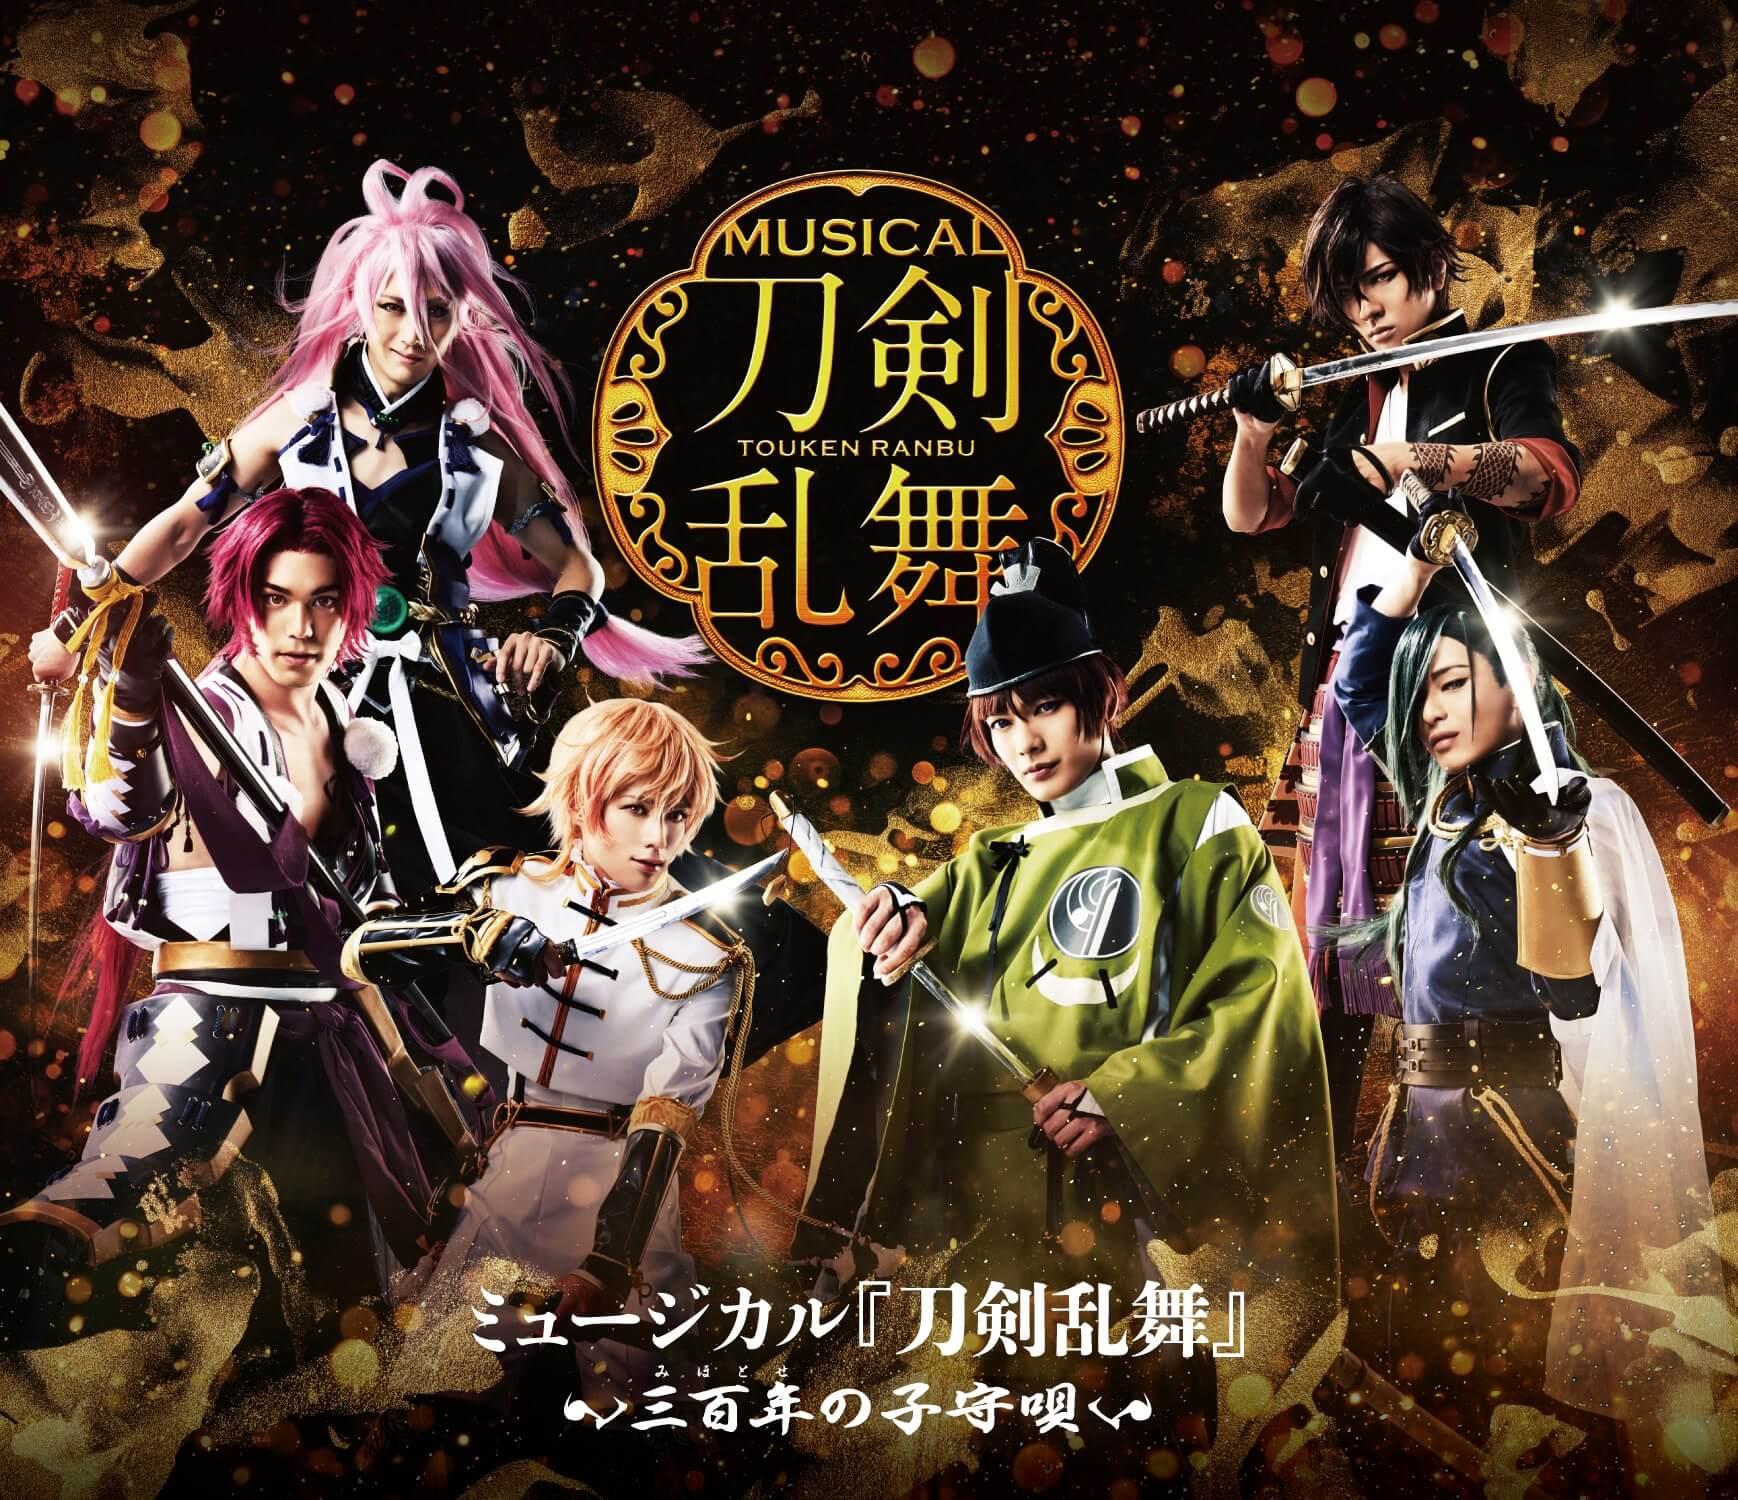 EMPB-4 / ミュージカル『刀剣乱舞』〜三百年の子守唄〜 / ミュージカル『刀剣乱舞』 / Blu-ray